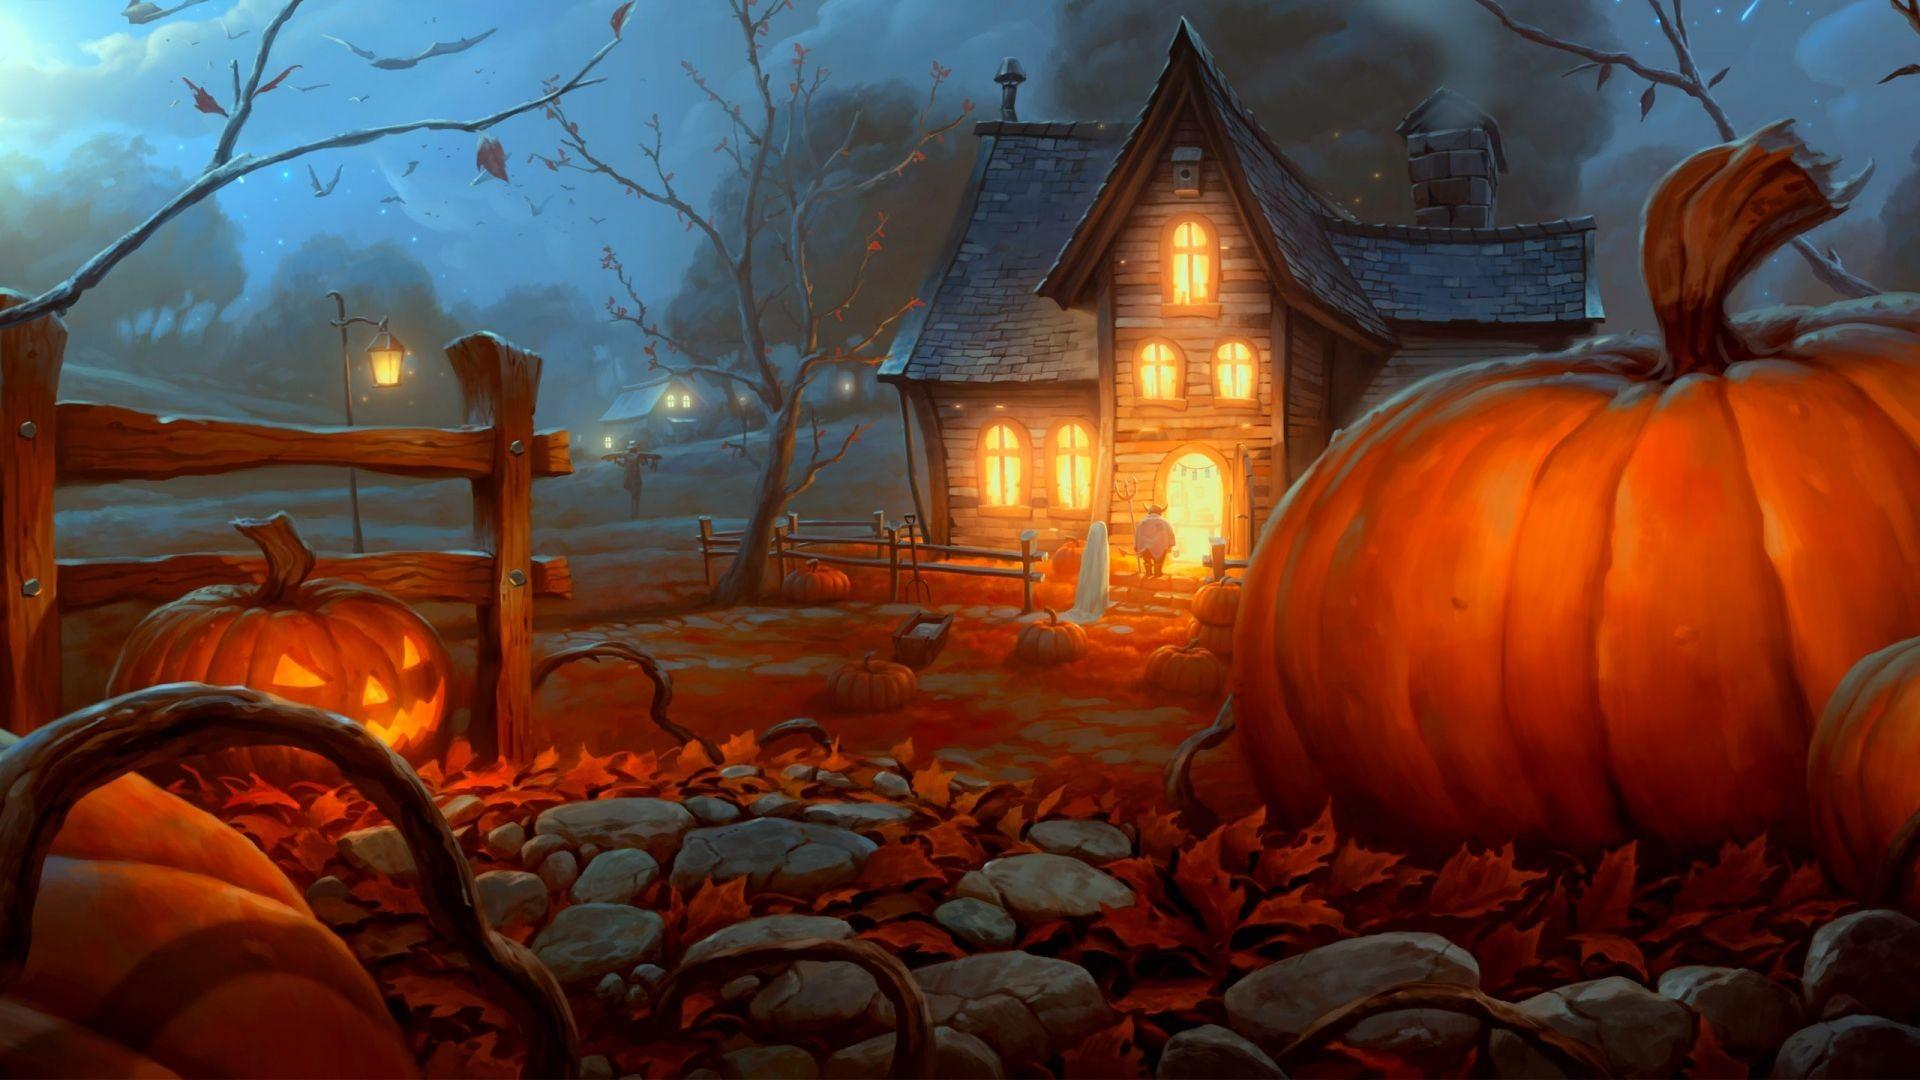 hd halloween wallpaper